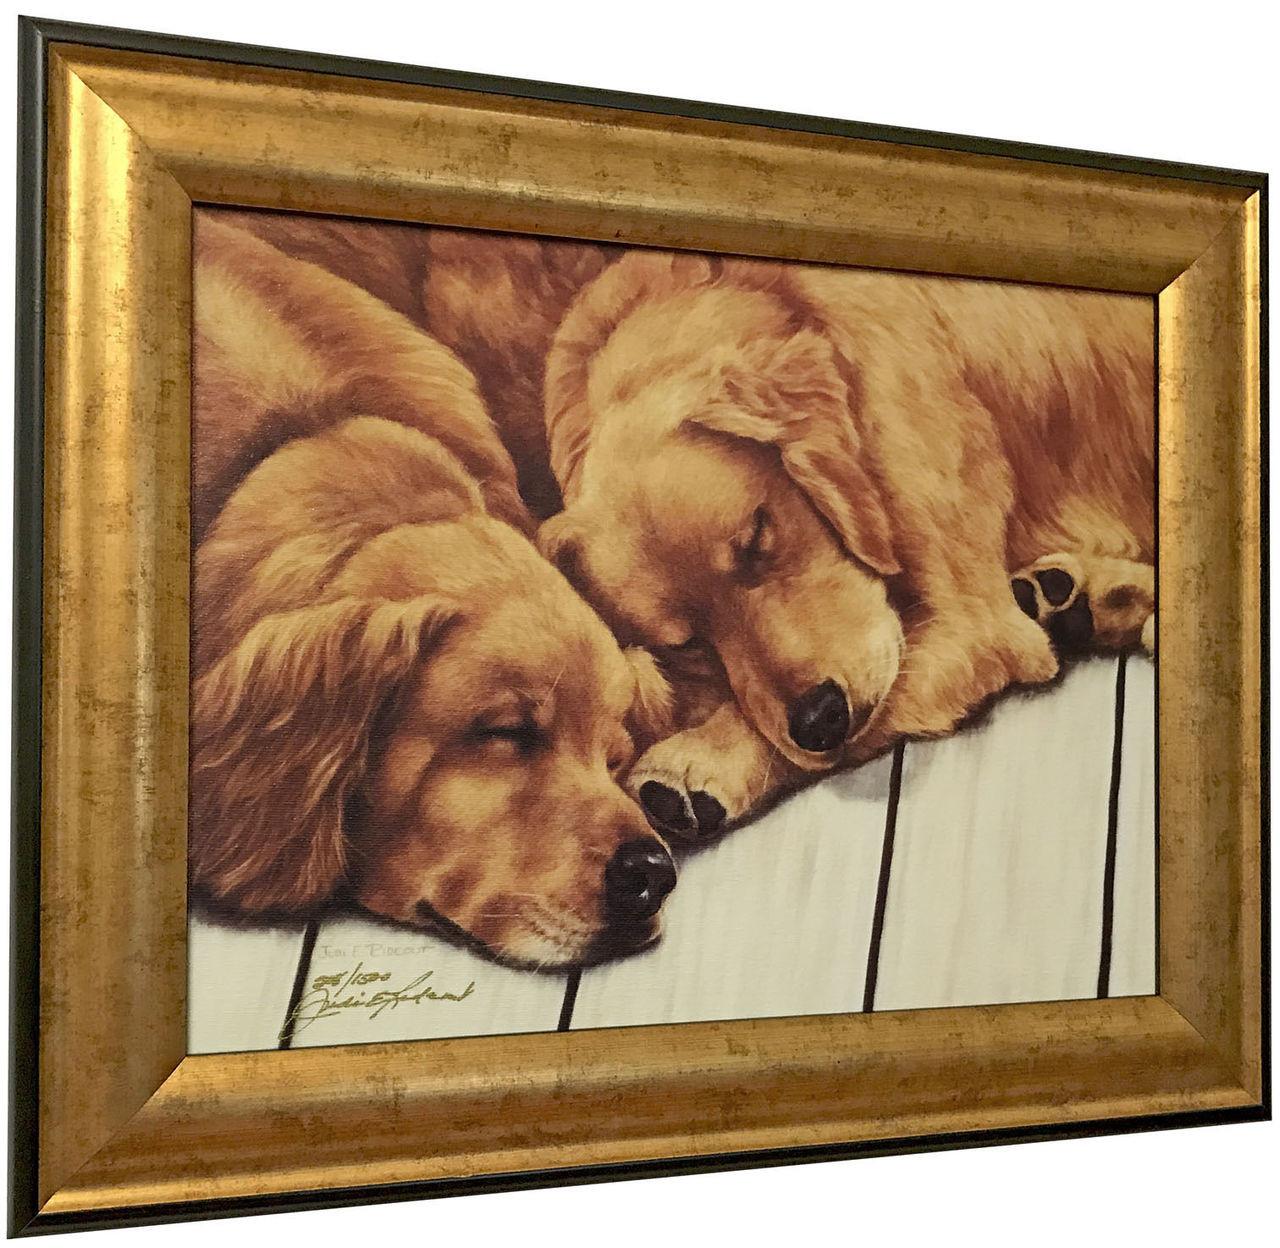 Judi rideout best buddies canvas framed le signed numbered judi rideout best buddies canvas framed le signed numbered jeuxipadfo Choice Image